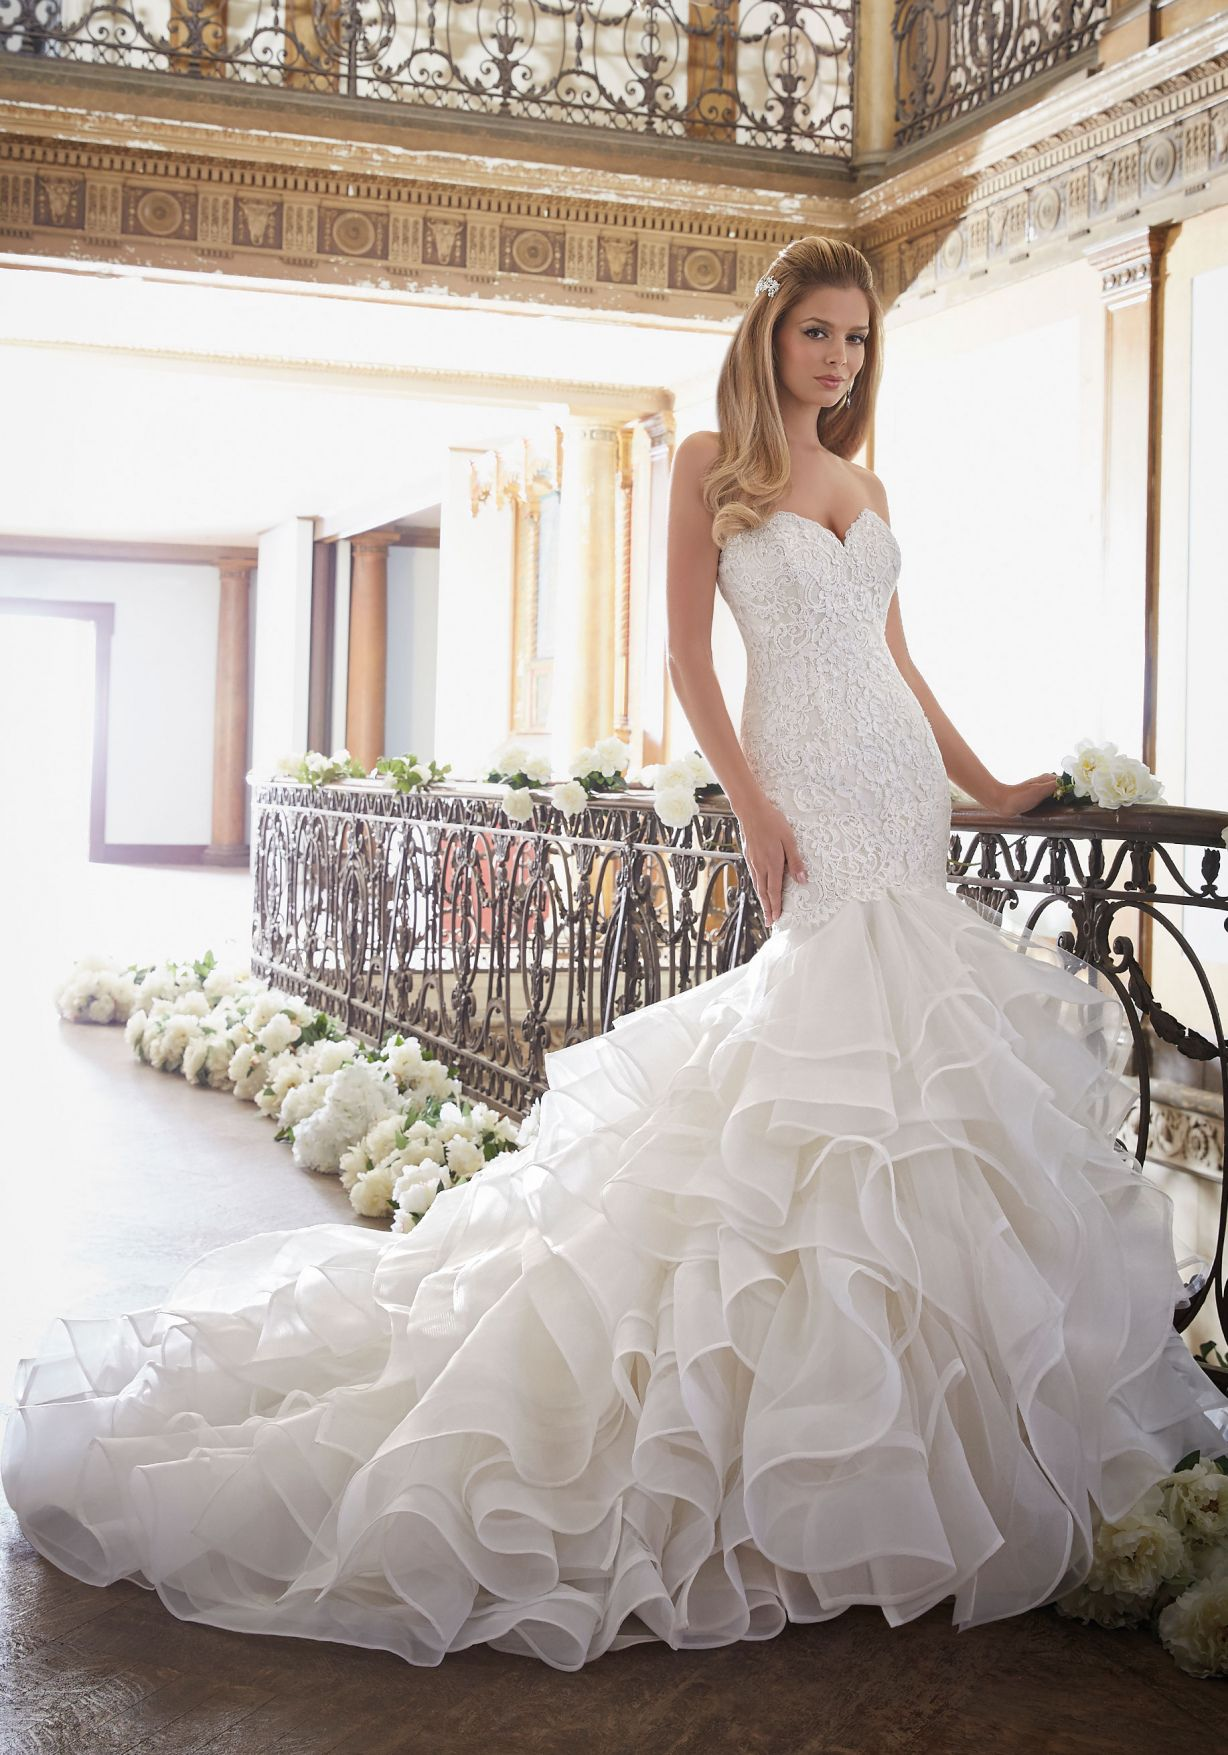 55+ organza Mermaid Wedding Dress - Wedding Dresses for Fall Check more at http://svesty.com/organza-mermaid-wedding-dress/